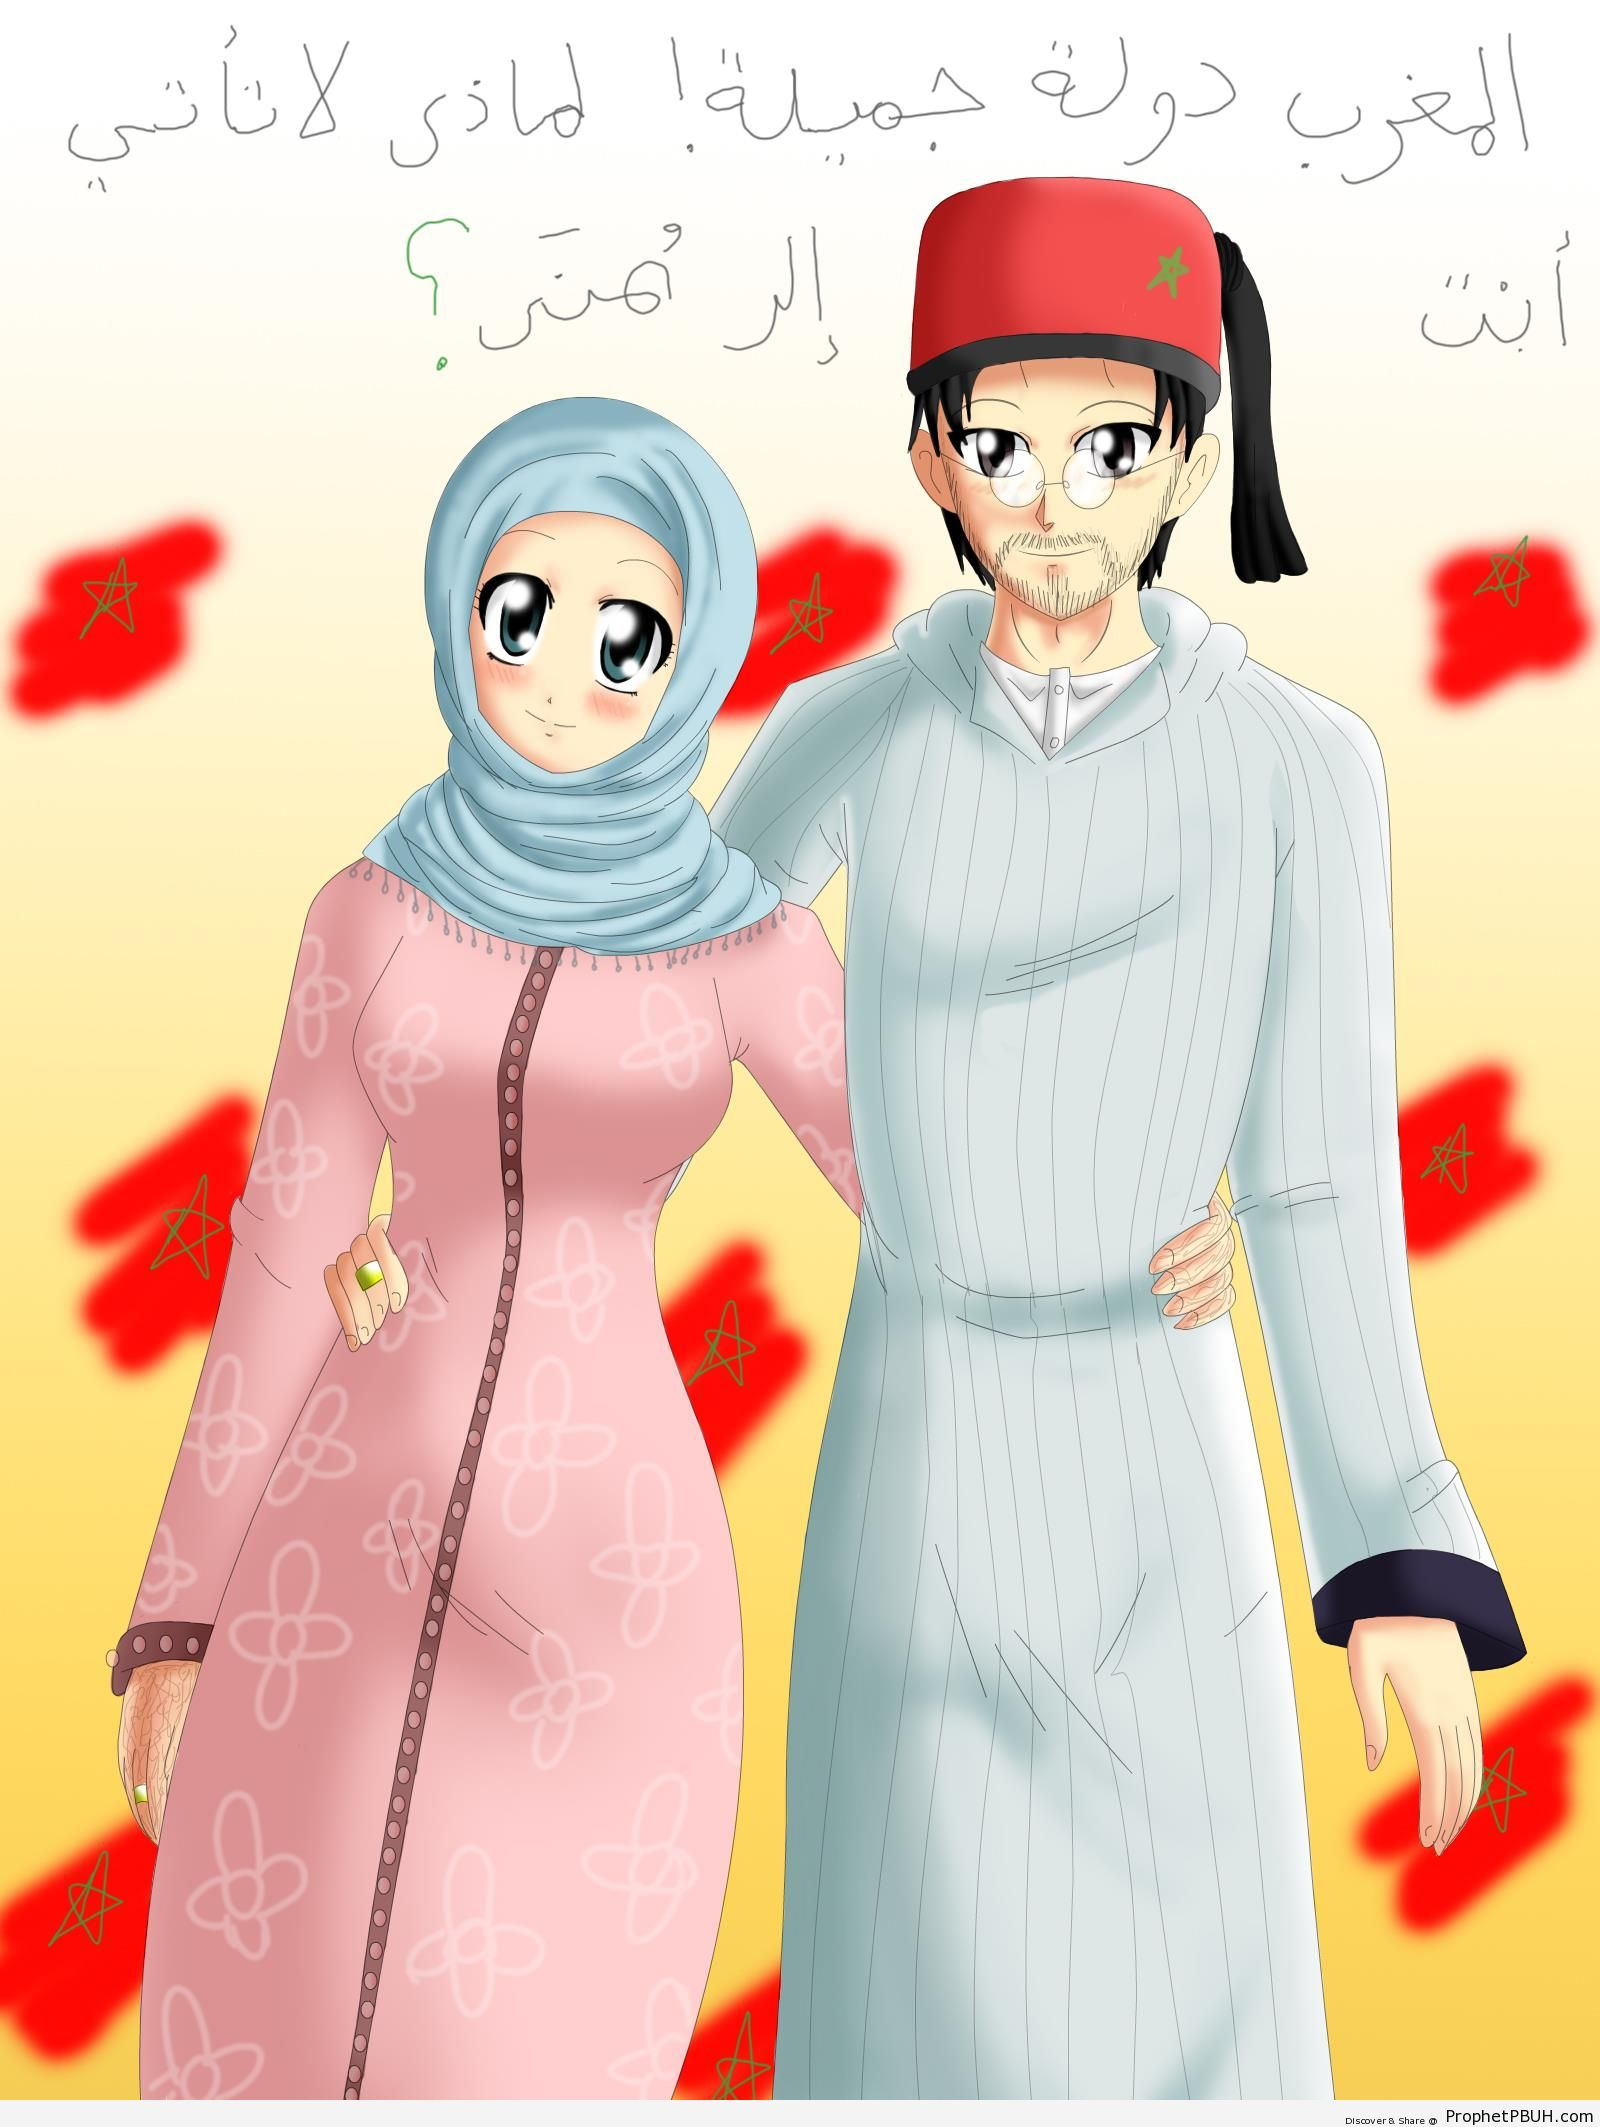 Maghribi (Moroccan) Muslim Couple - Drawings